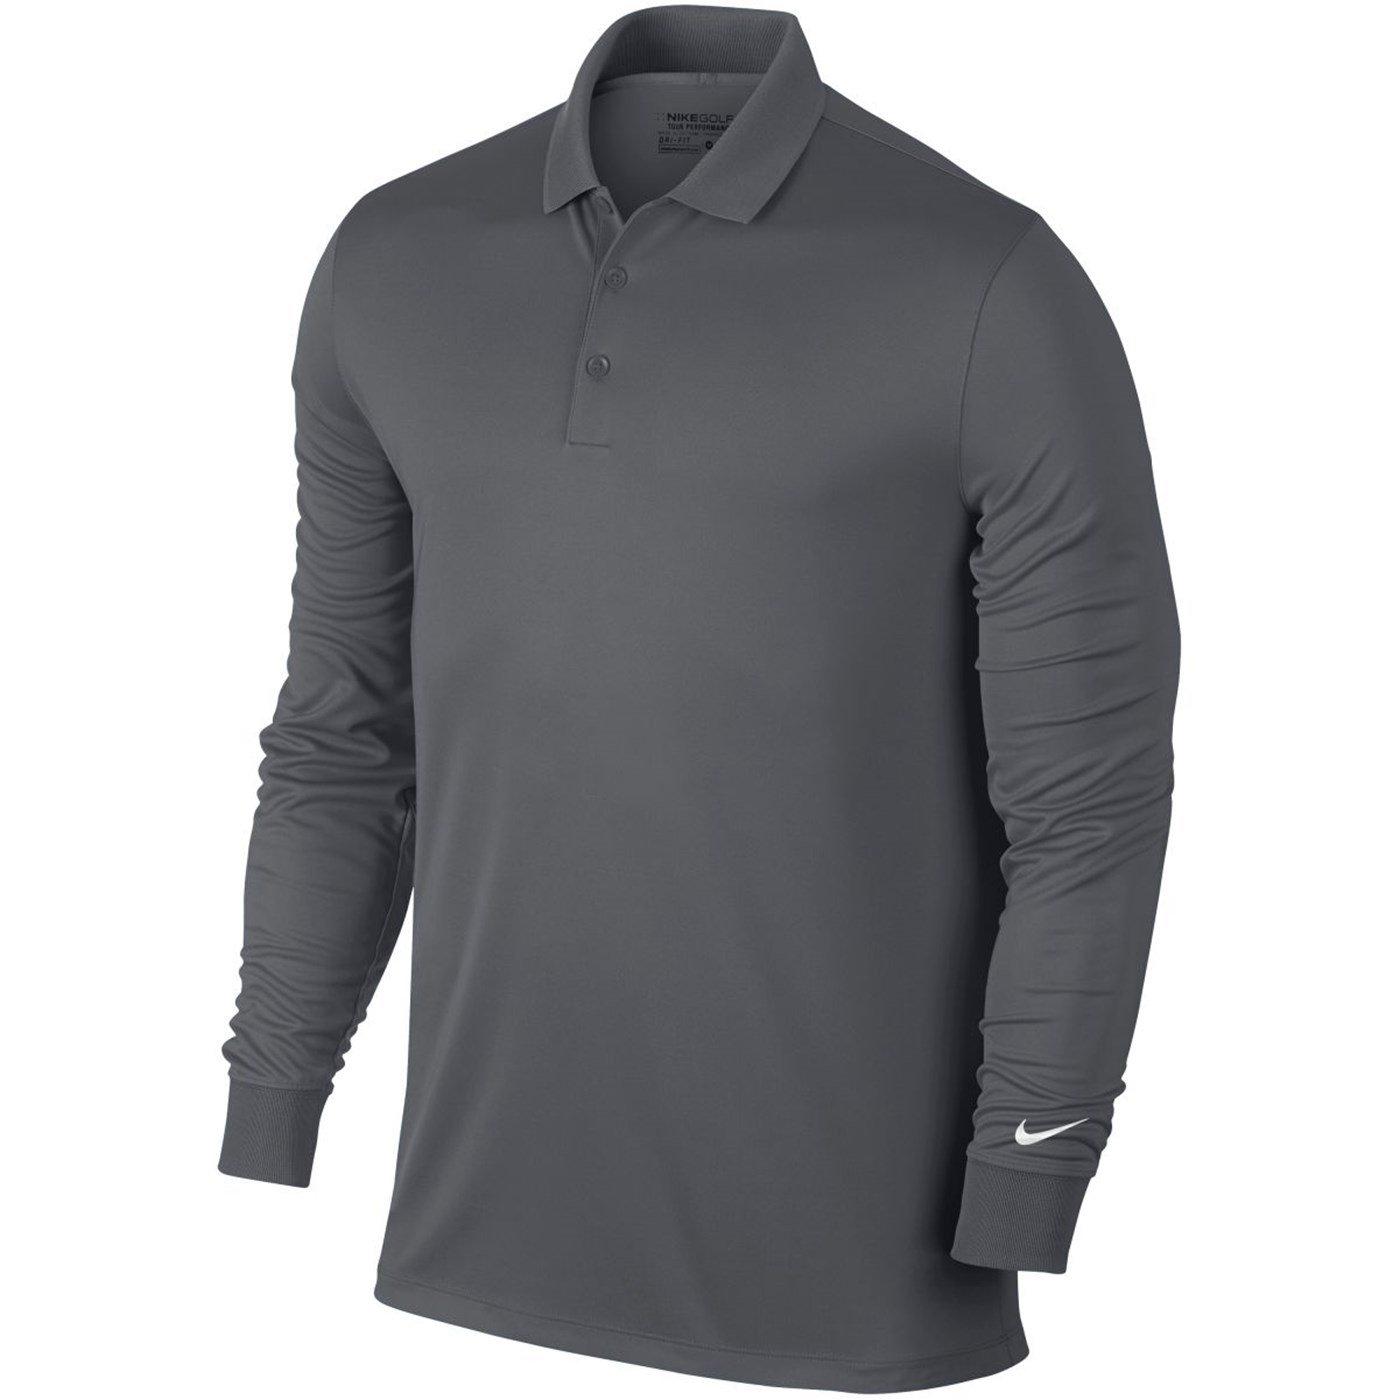 21a2b55dd Long Sleeve Golf Shirts With Collar - DREAMWORKS